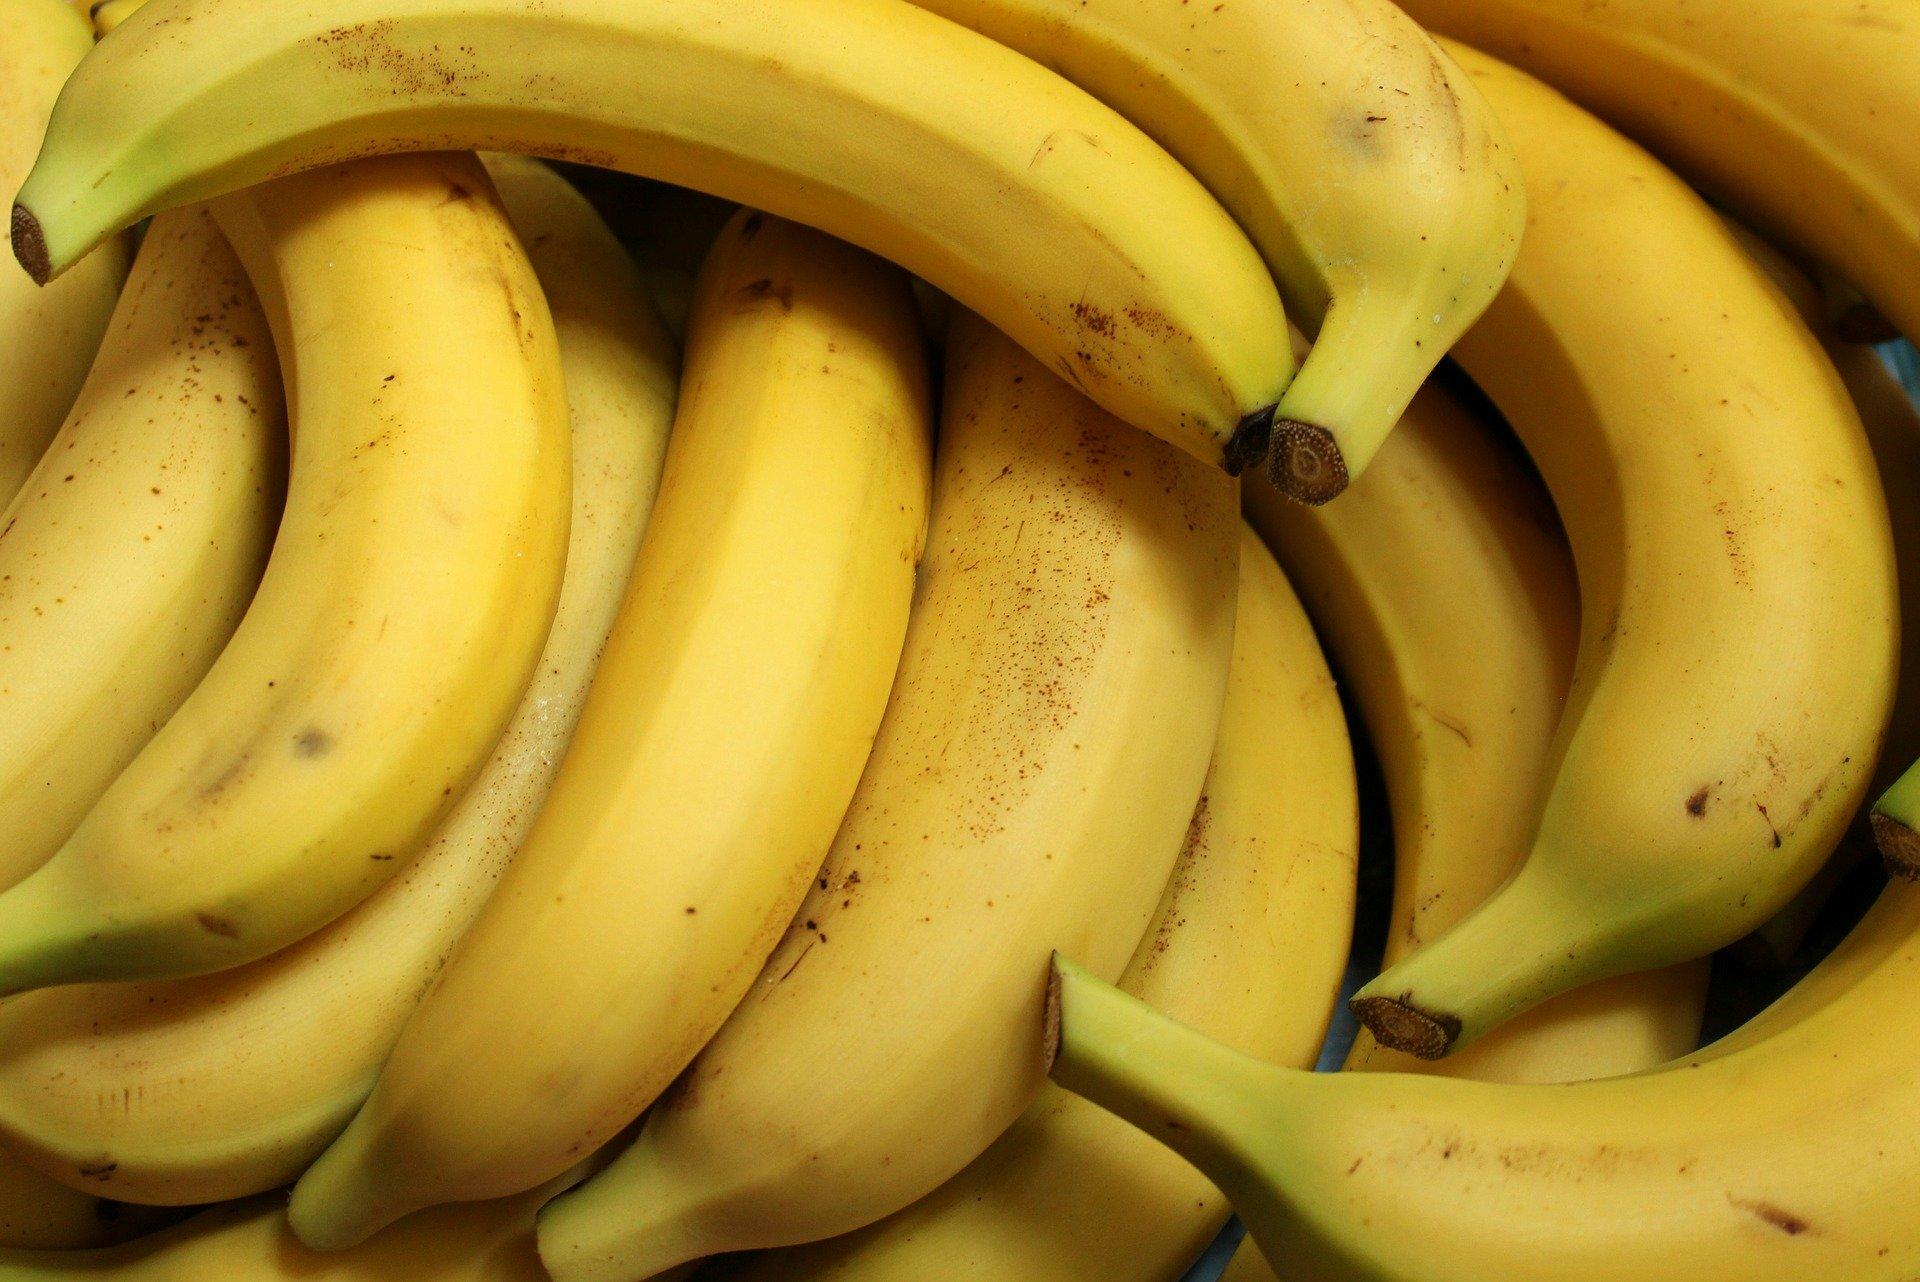 Bananas: The Best Wellness Food